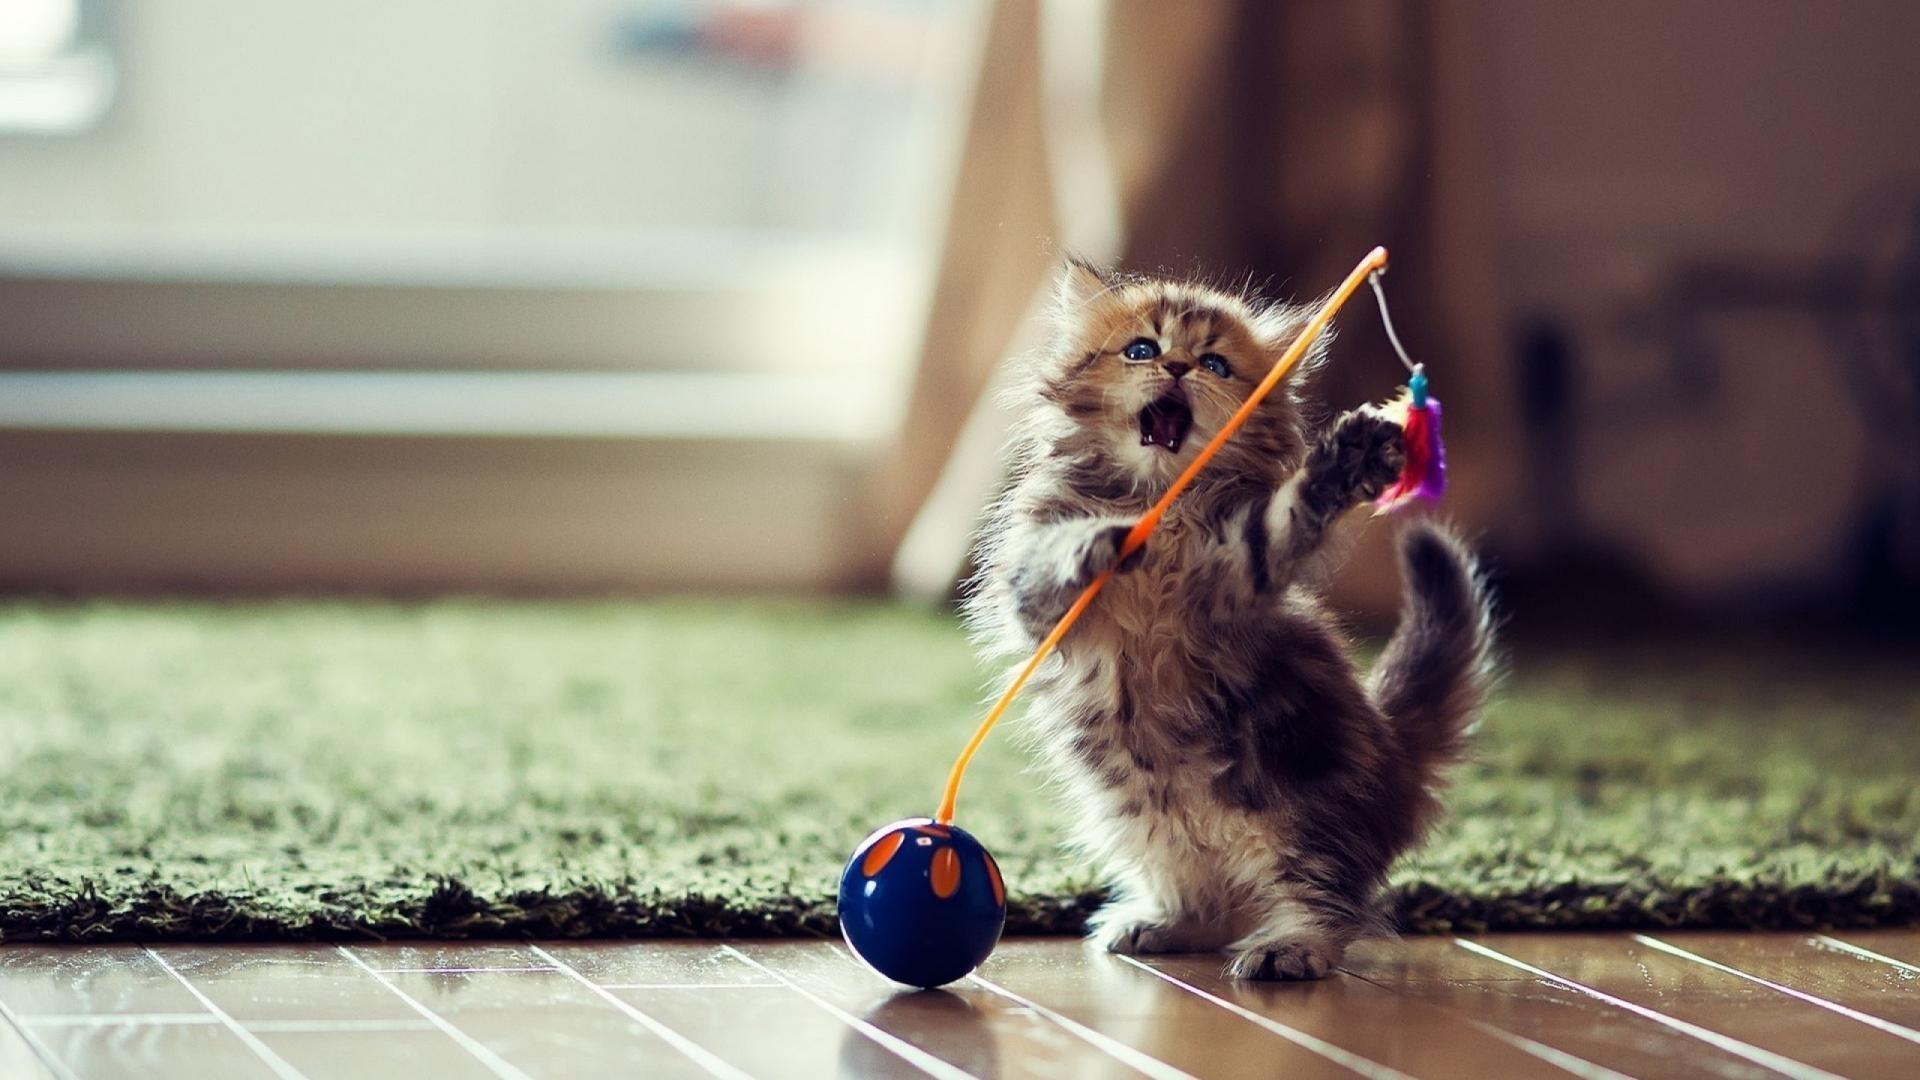 Funny Cat Wallpaper | Download Wallpapers